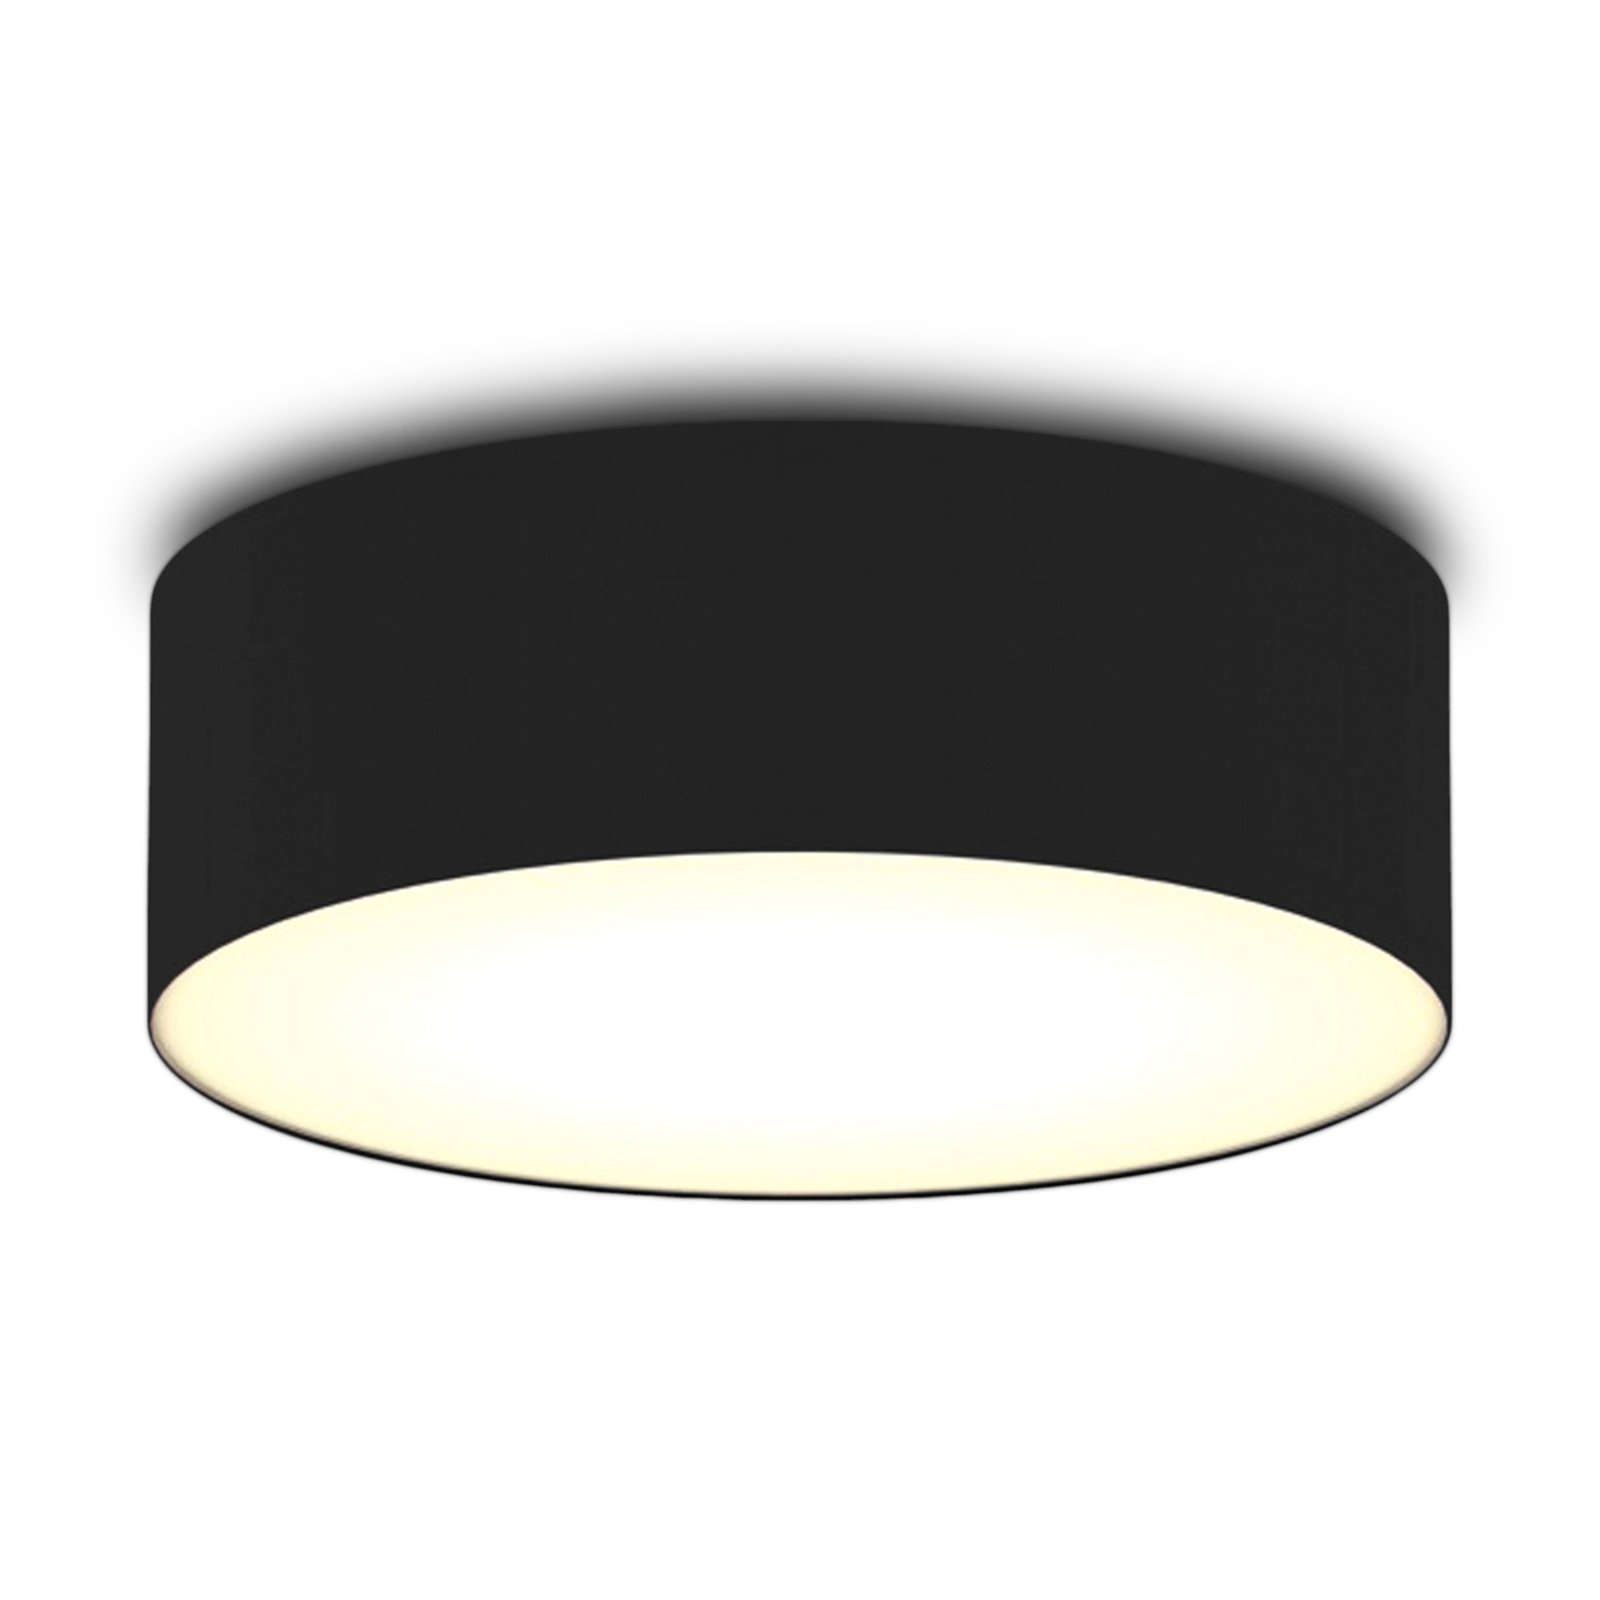 Czarna lampa sufitowa CEILING DREAM, 30 cm